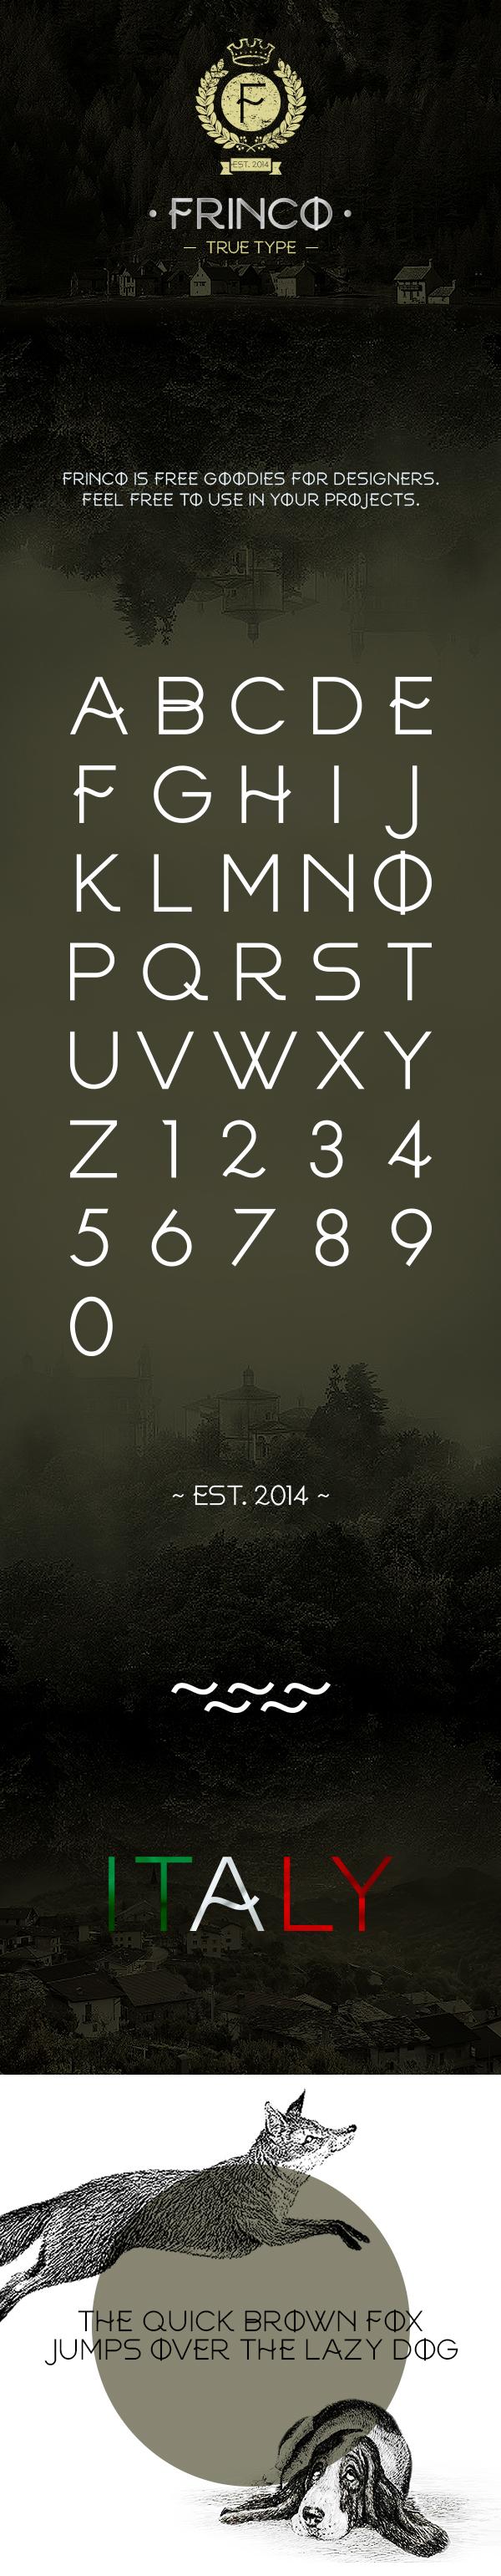 Free font font Typeface caps uppercase FRINCO